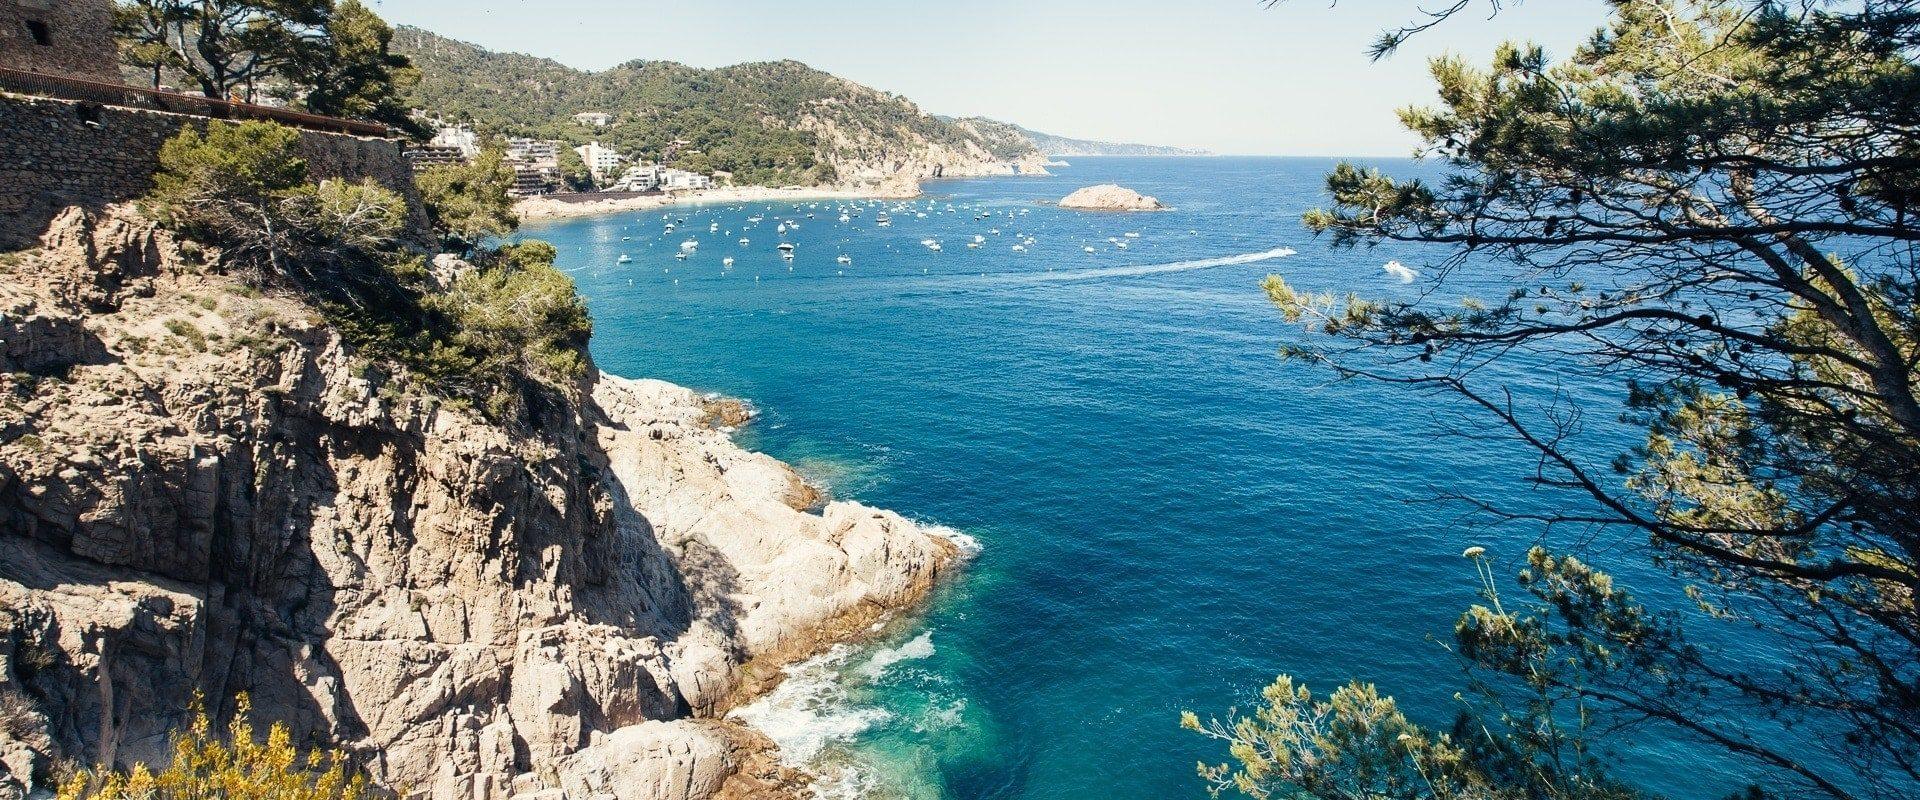 Tossa De Mar, Le Joyau De La Catalogne